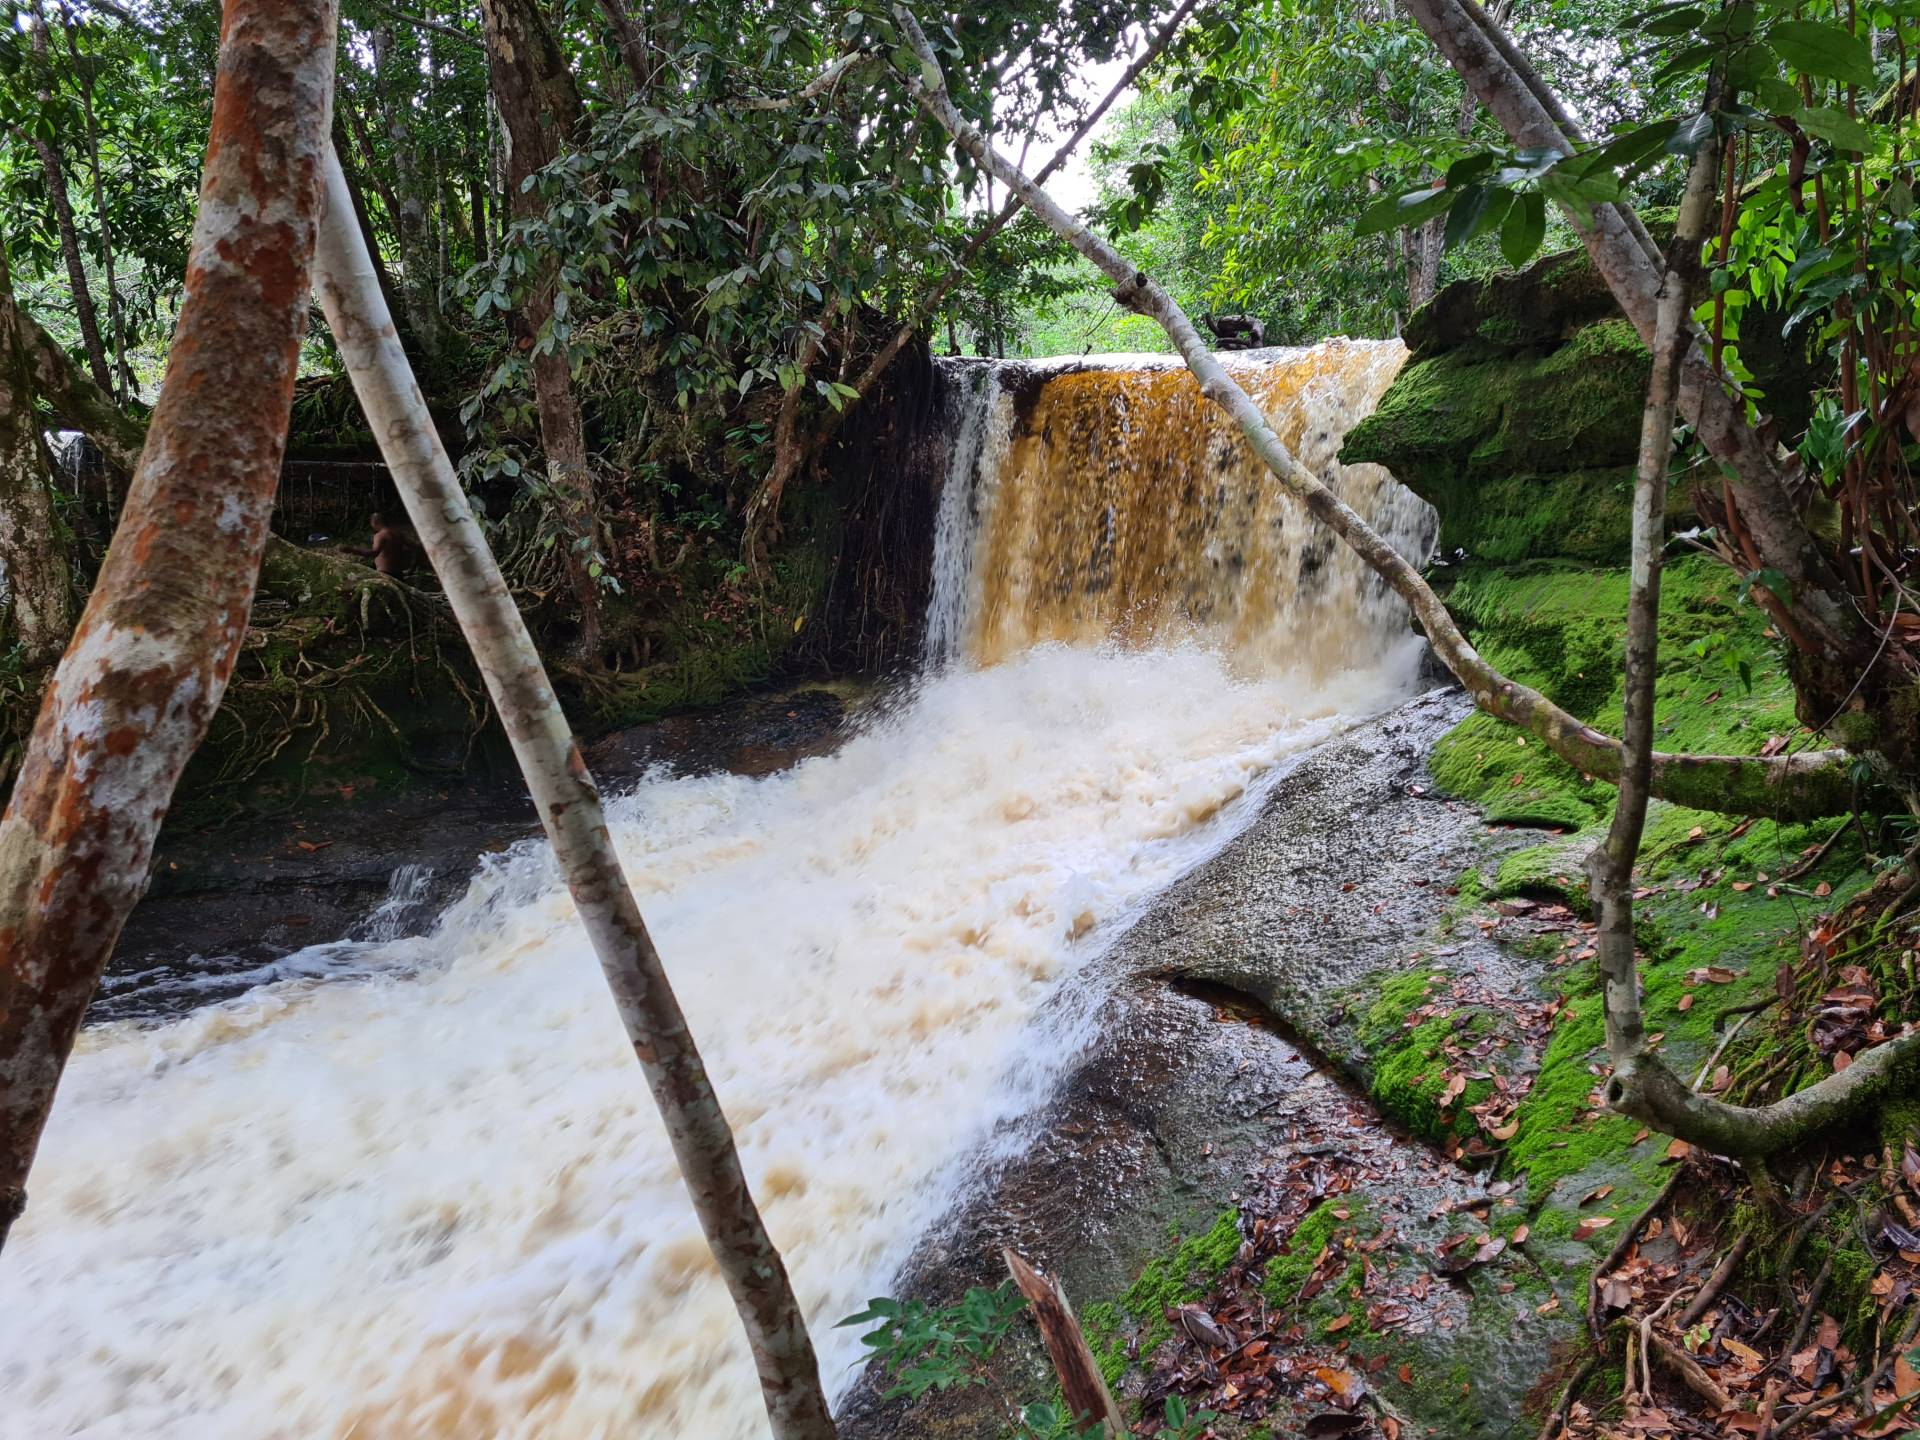 водопад Моко в Бразилии